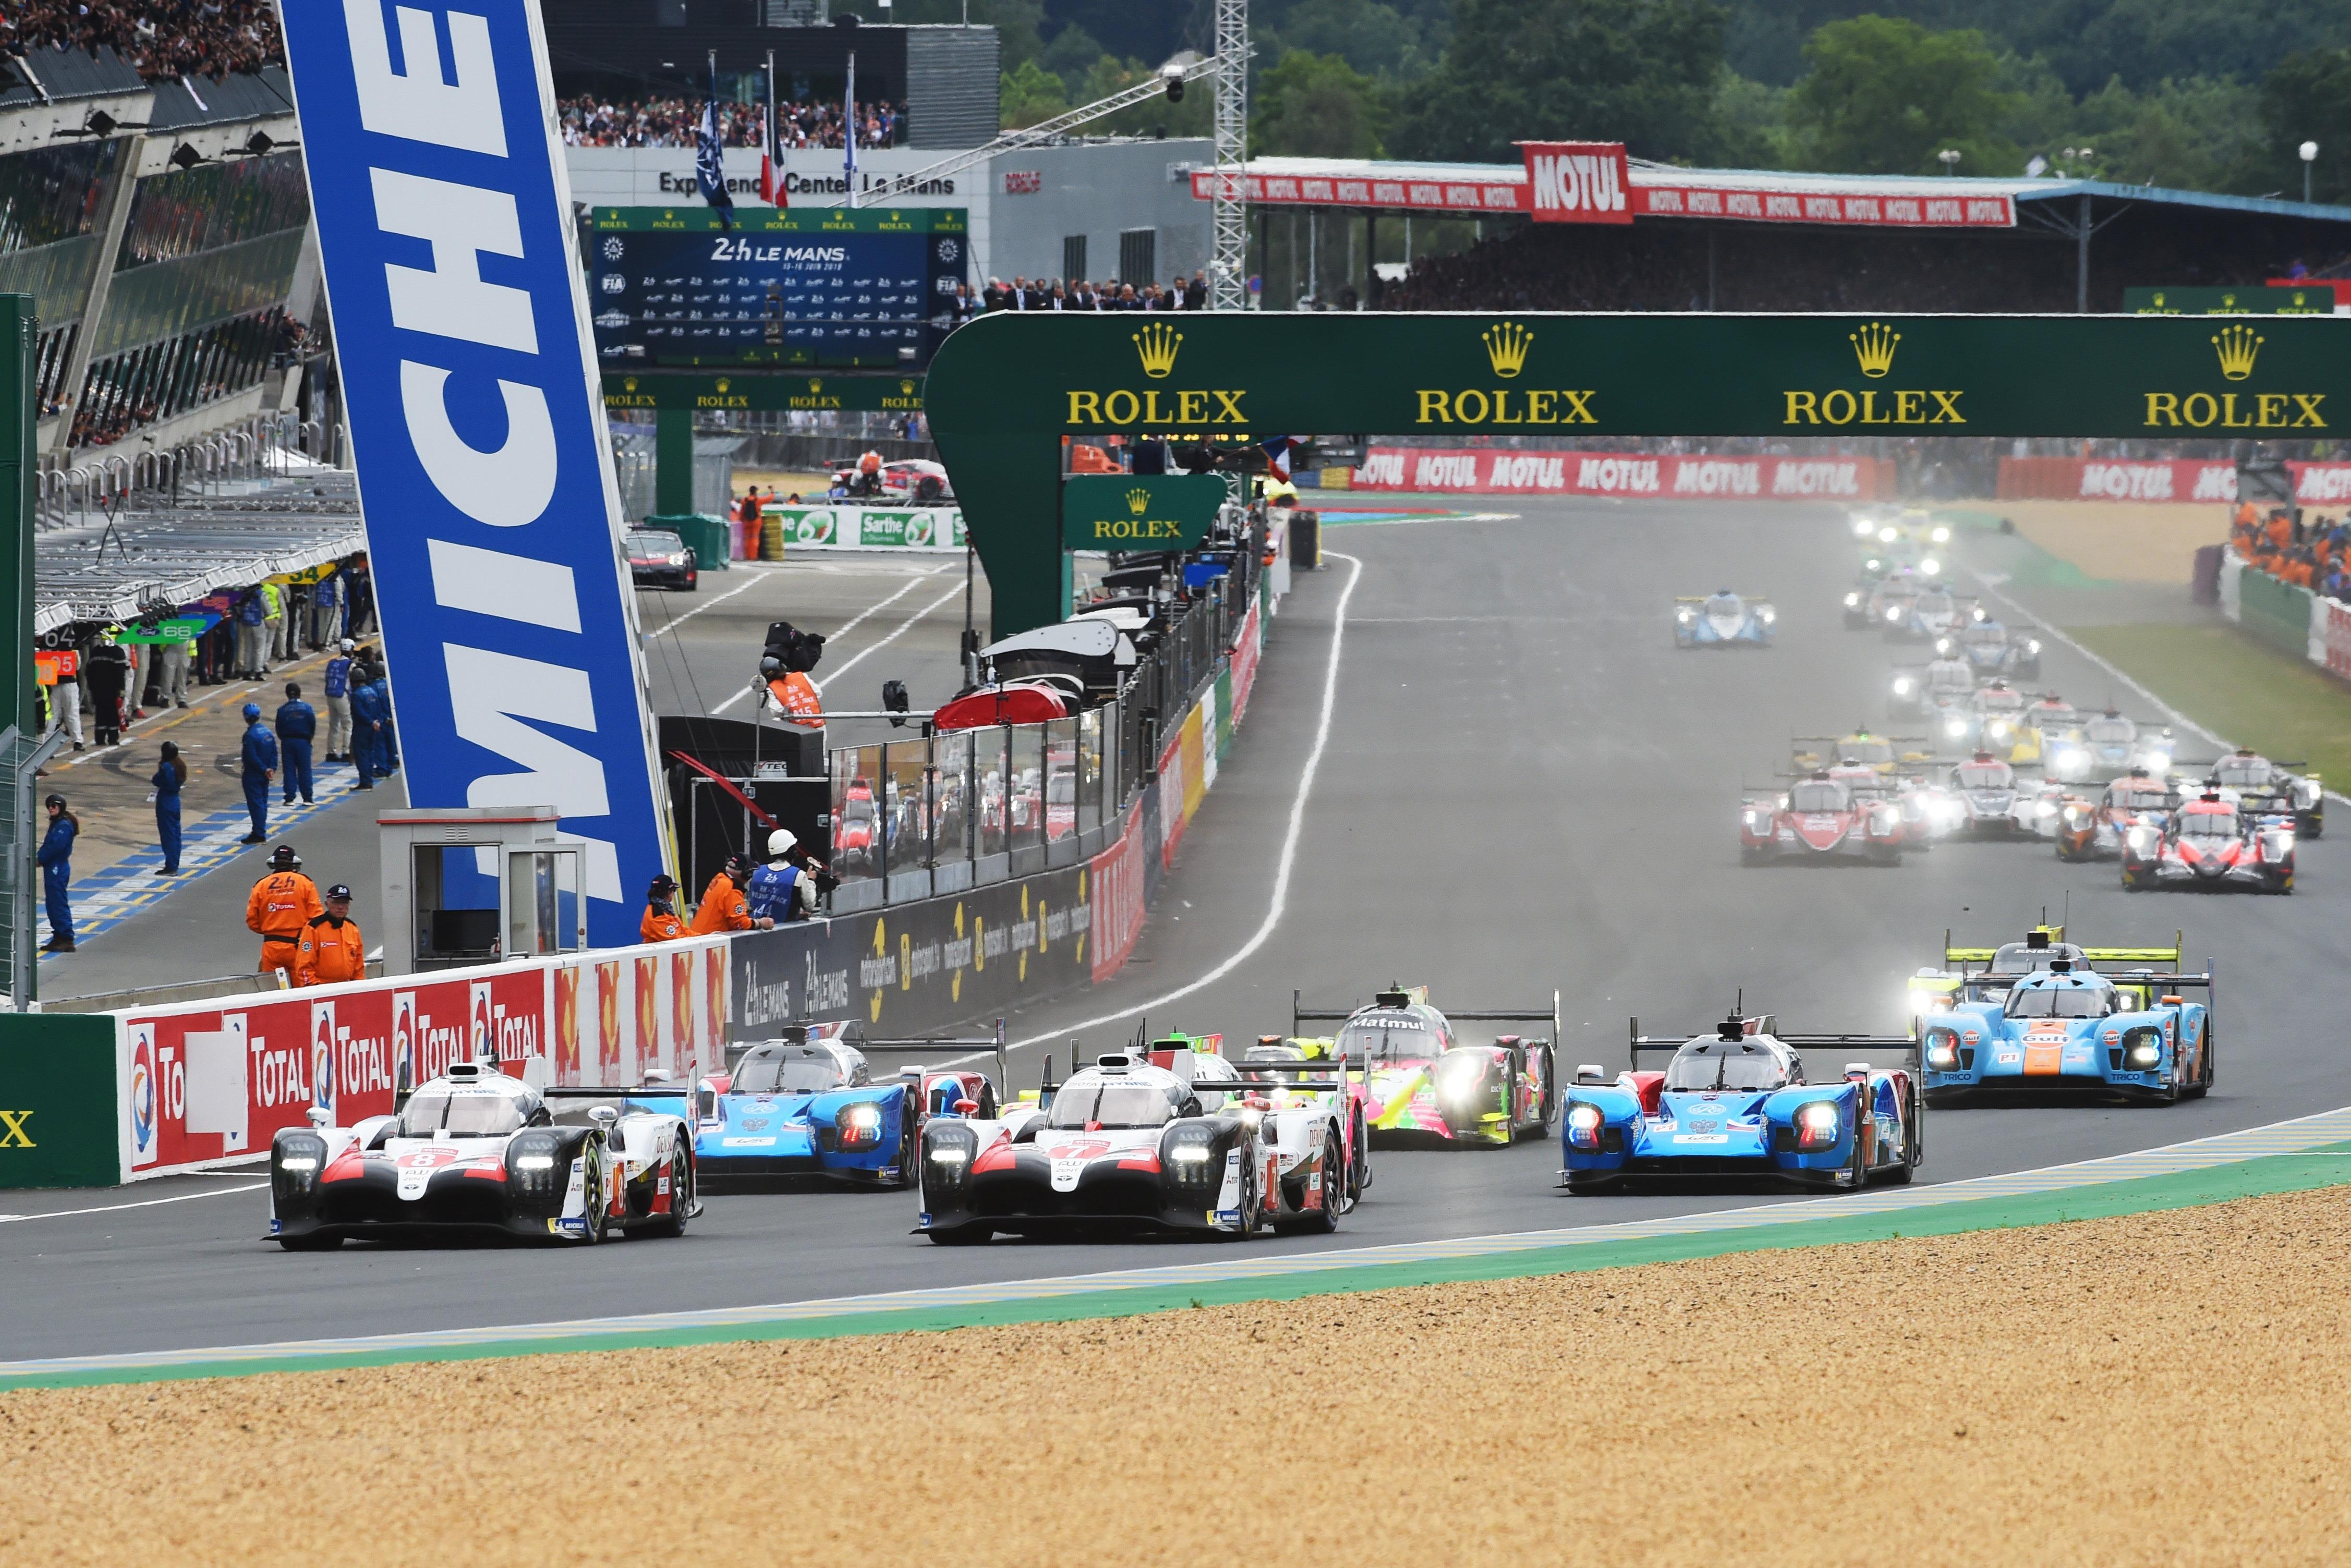 2019 Le Mans 24 Hours start